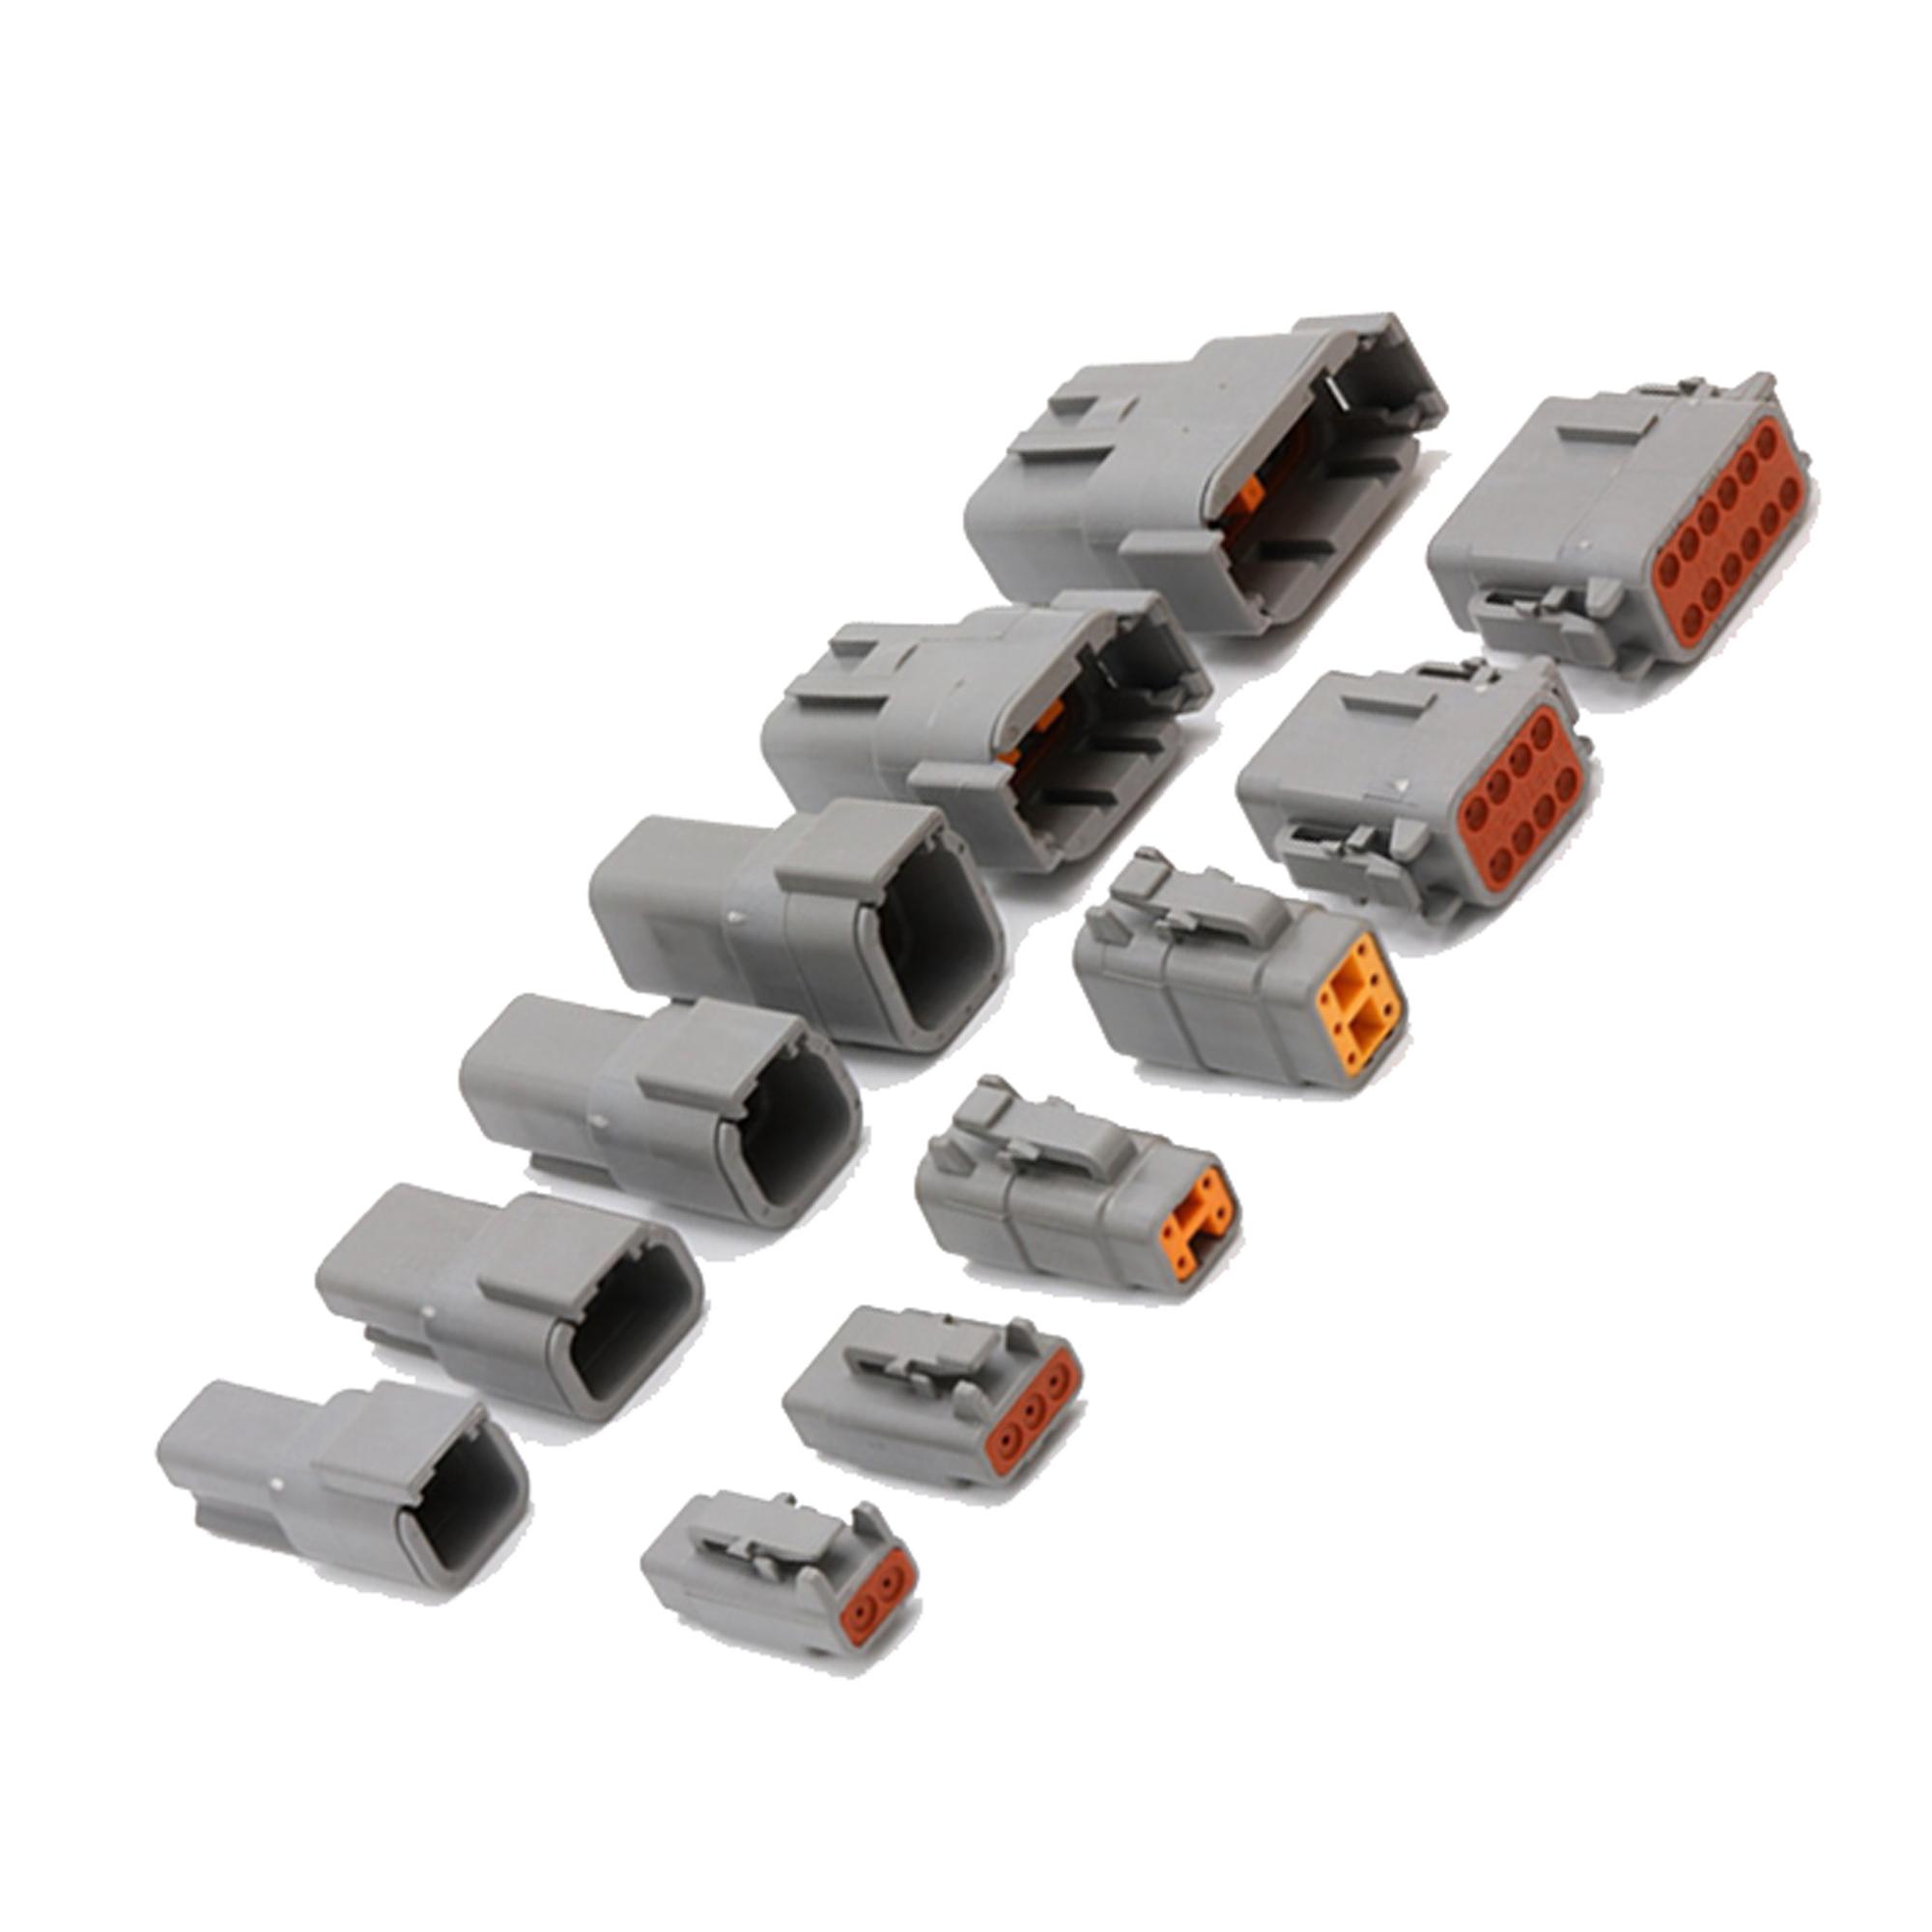 1/set Deutsch DT06//DT04/2//3//4//6//8//12P motore cambio motore impermeabile connettore elettrico per auto Bus Truck